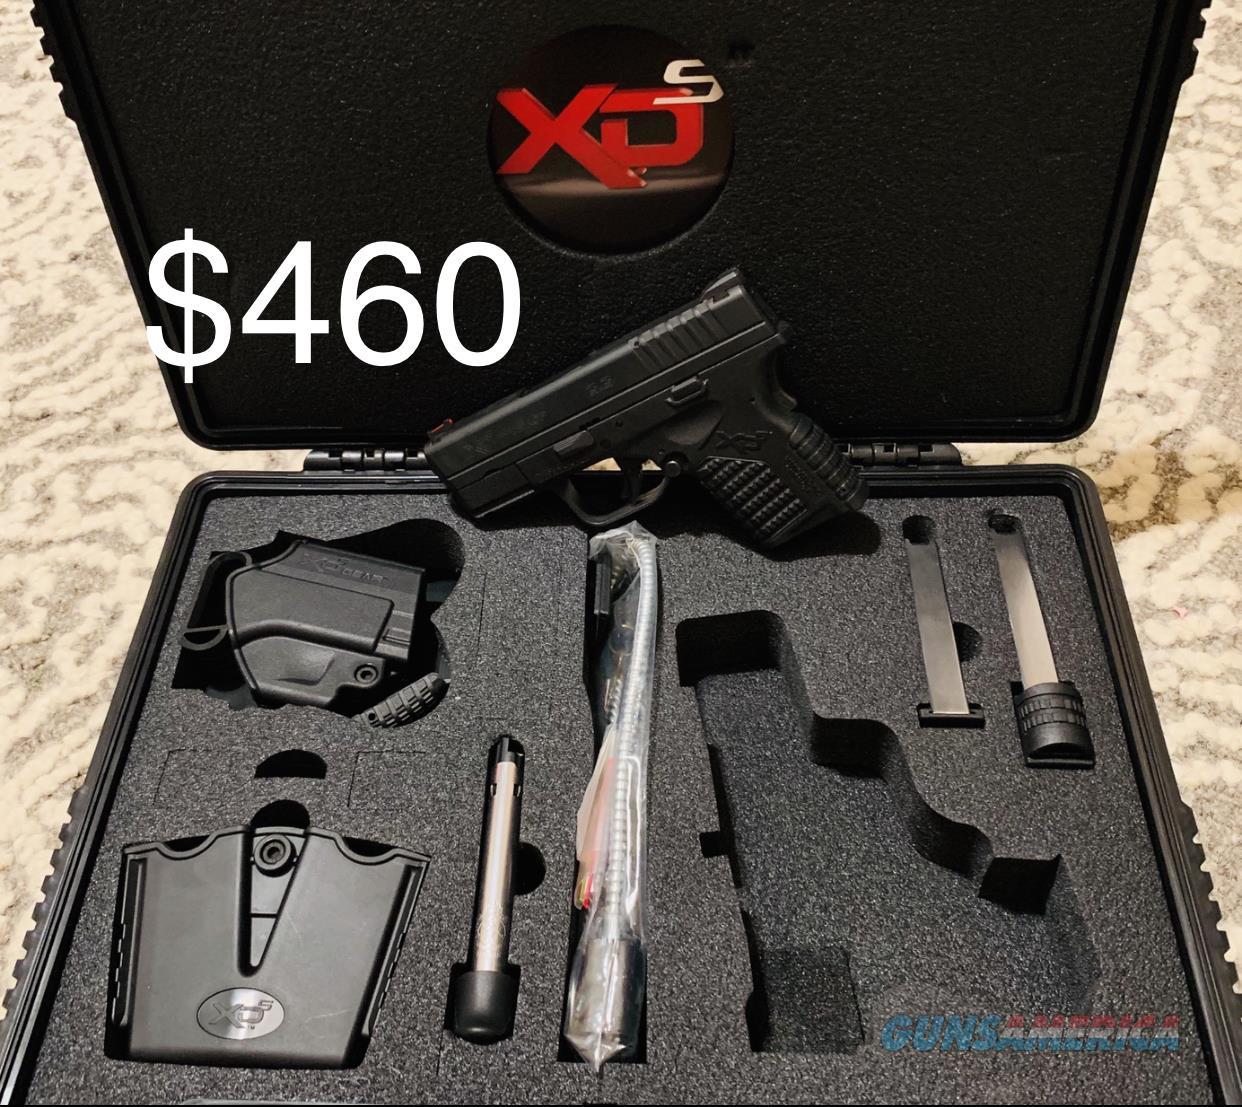 Springfield XD-S .45   Guns > Pistols > Springfield Armory Pistols > XD-S